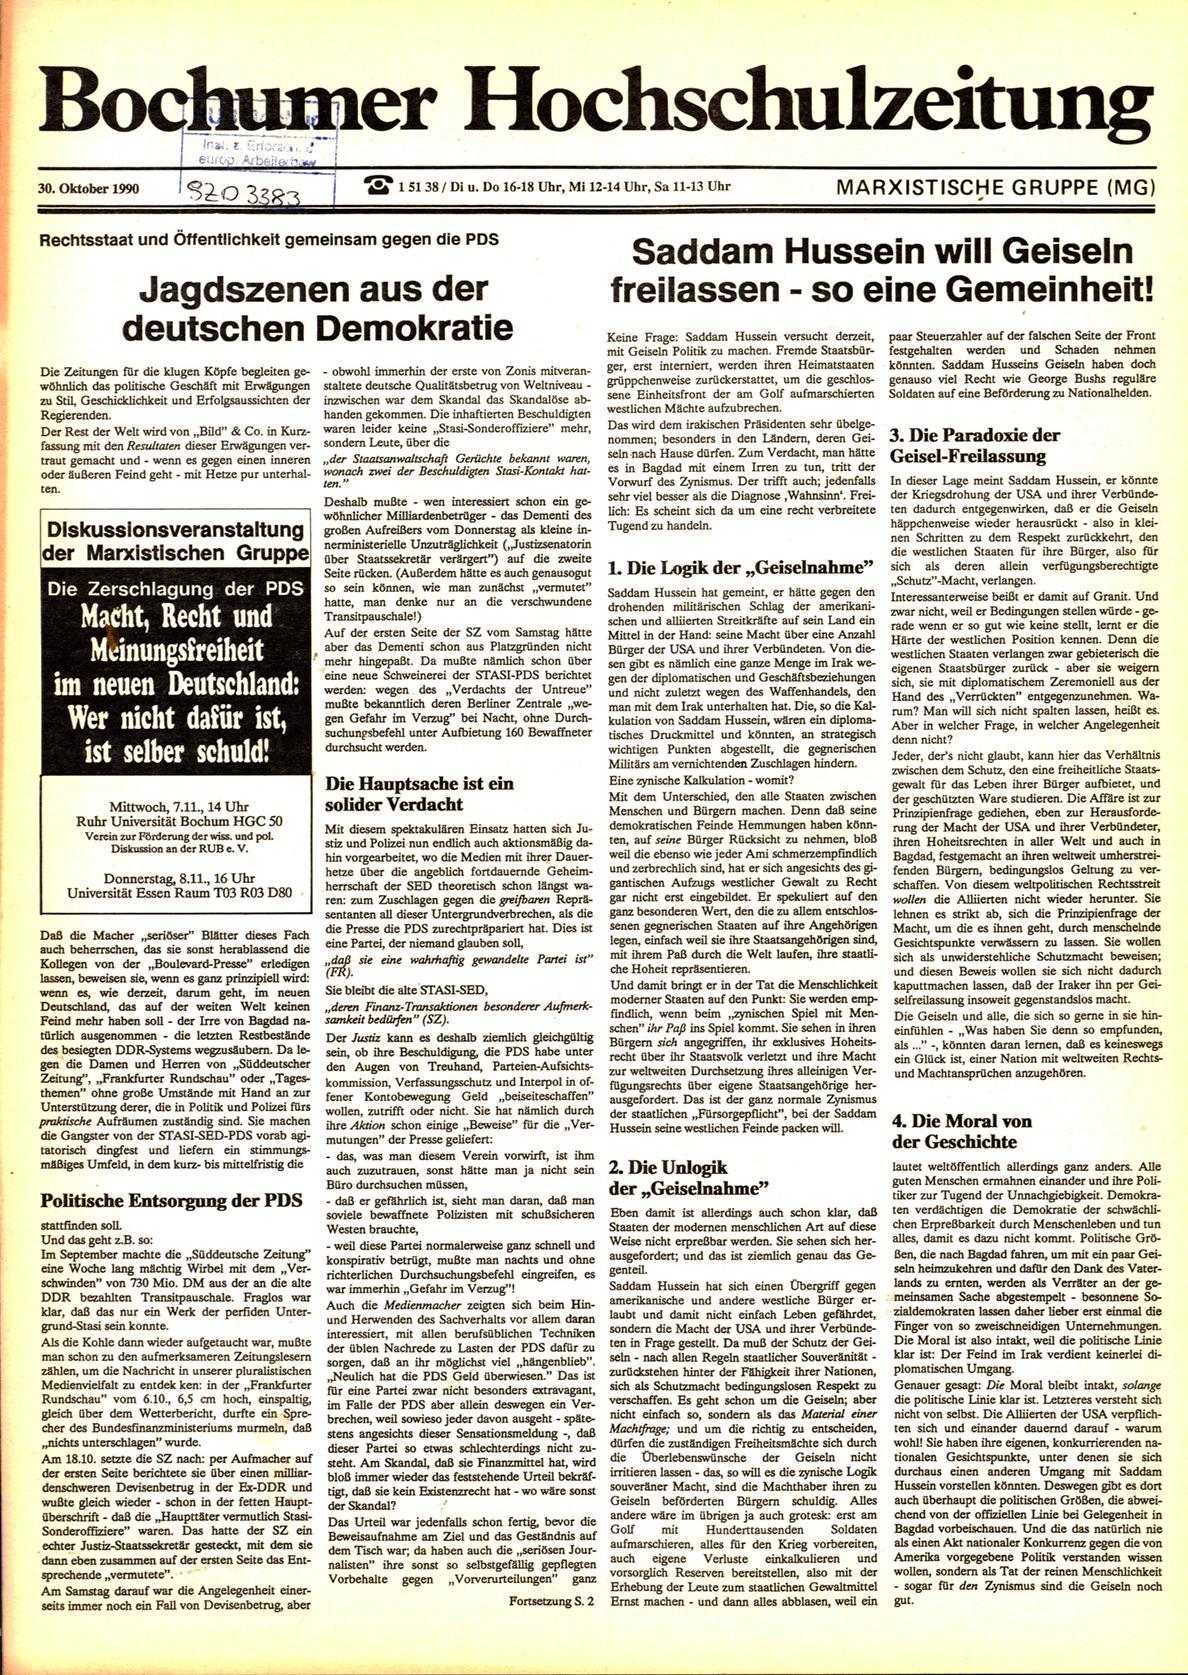 Bochum_BHZ_19901030_001